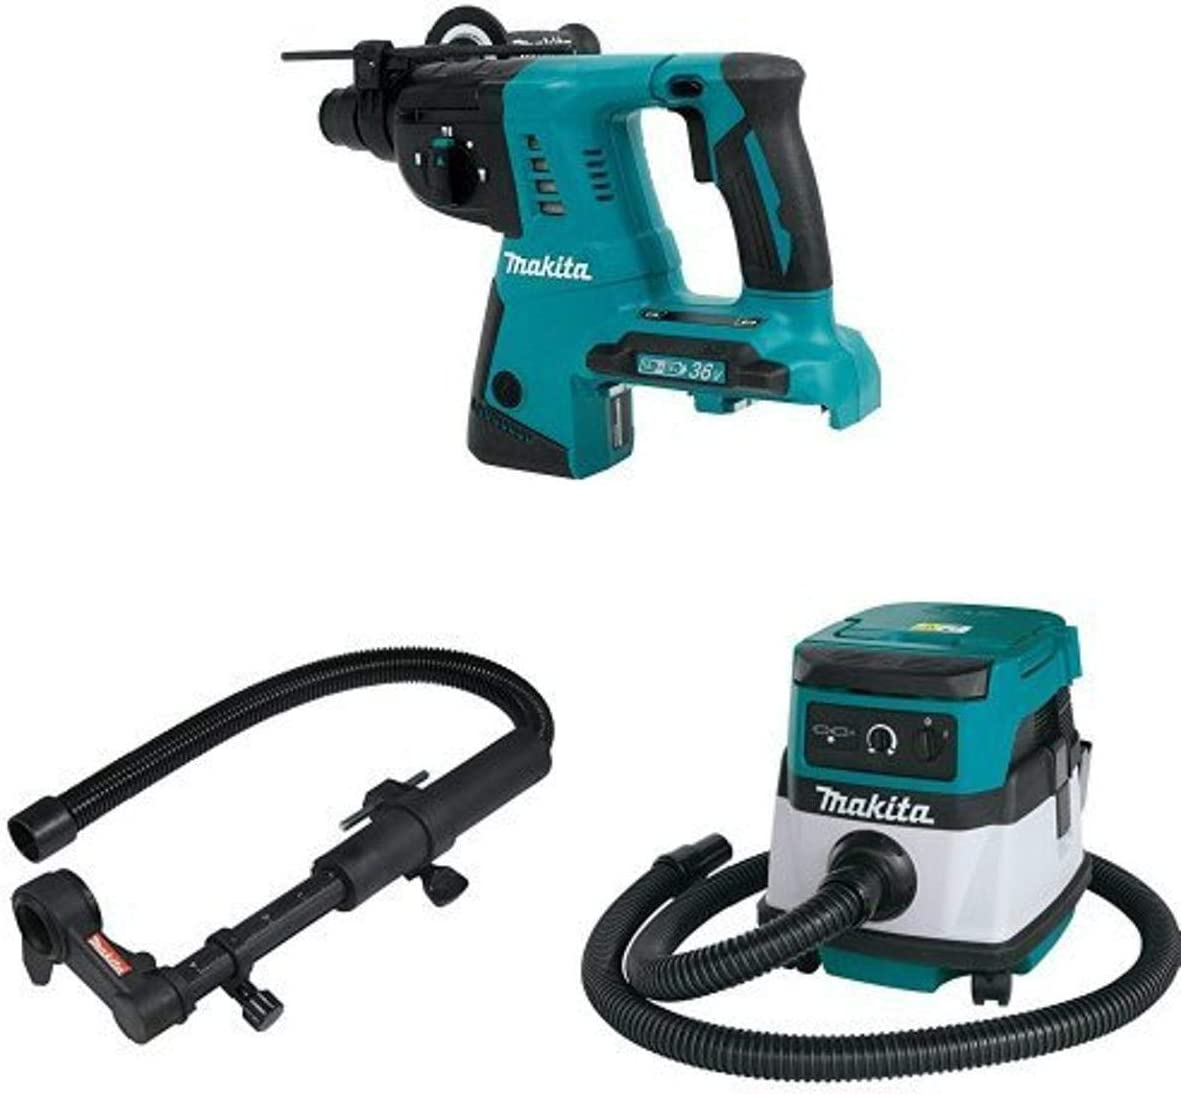 Makita Oklahoma City Mall XRH05Z Max 46% OFF 18V X2 LXT 36V Hammer Tool 1-Inch Only Rotary